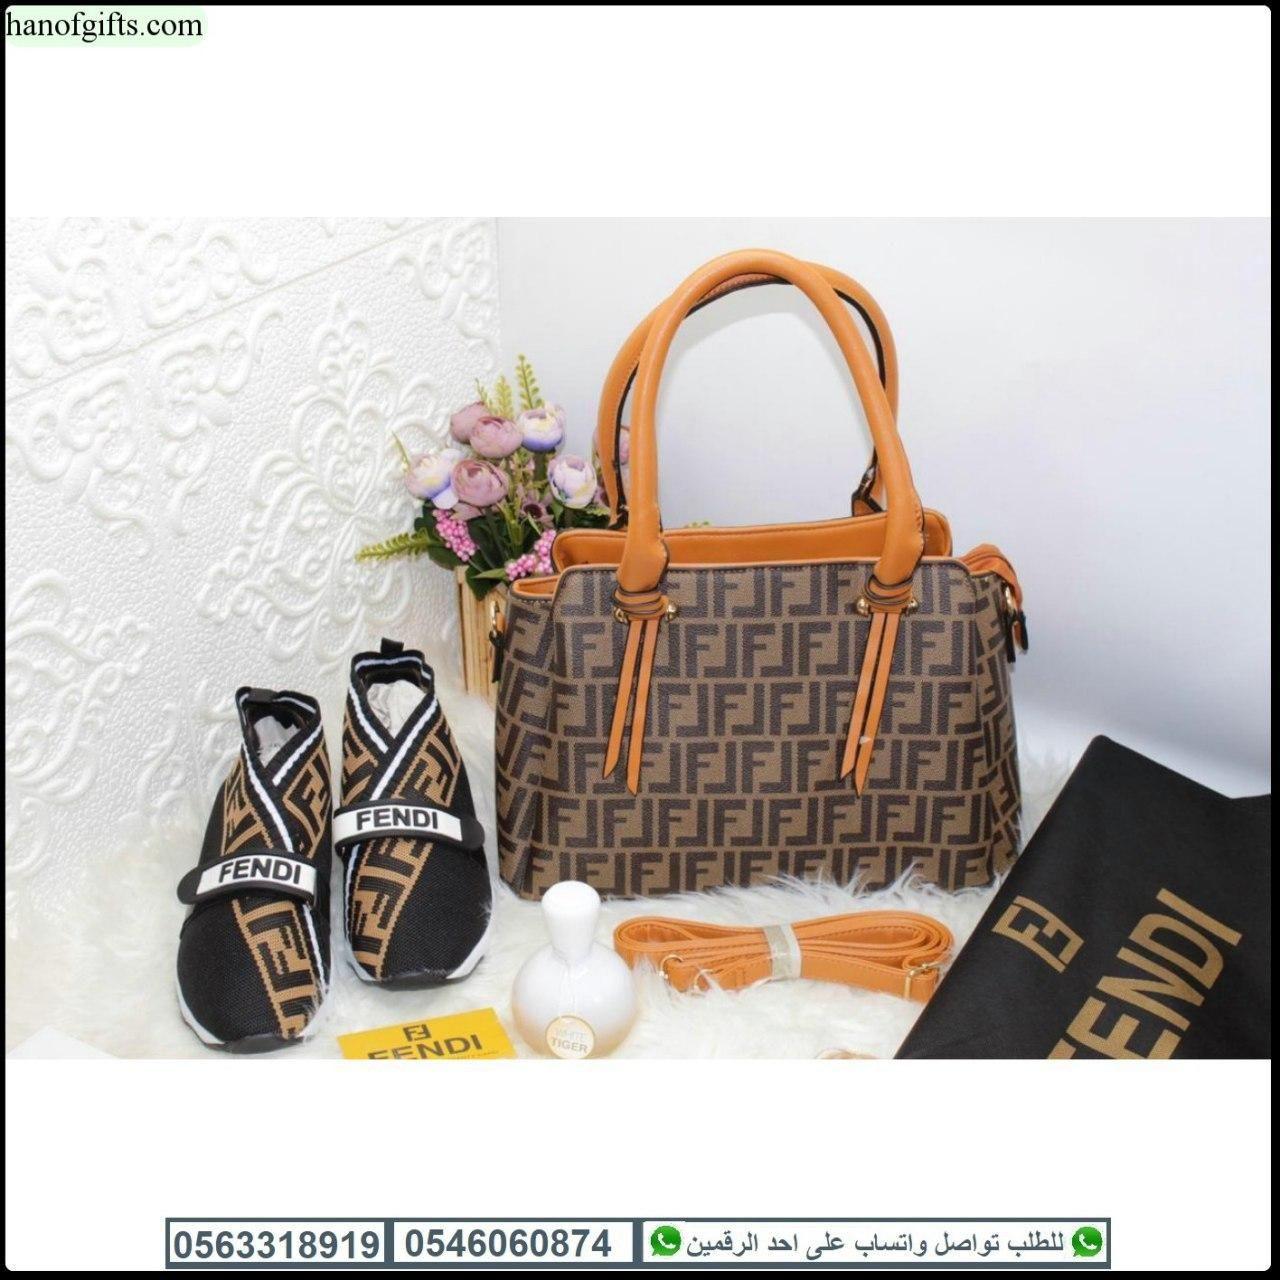 شنط فندي نسائيه Fendi مع شوز فندي و عطر شكل الماركه و كيس هدايا هنوف Louis Vuitton Speedy Bag Louis Vuitton Speedy Louis Vuitton